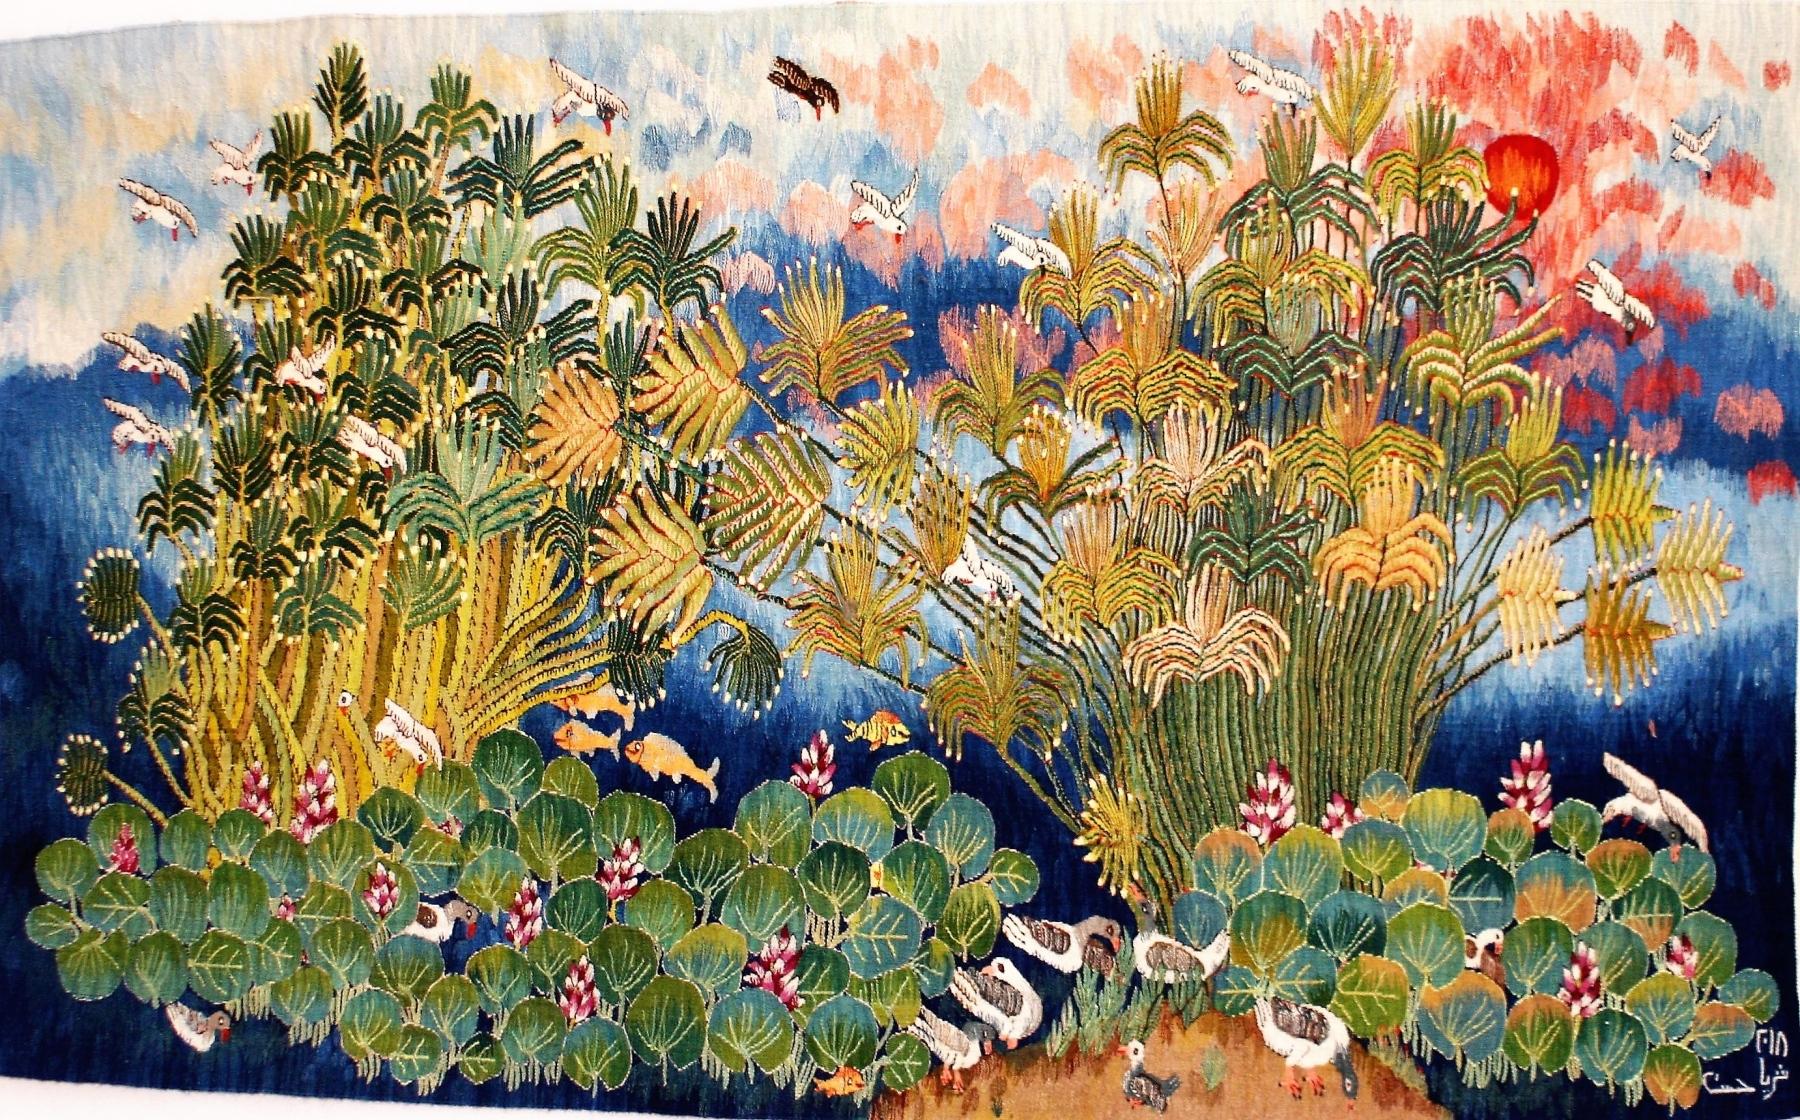 19-Nile-flowers-Papyrus-2018-111-1.85-x-1.10-m-Soraya-Hassan-1